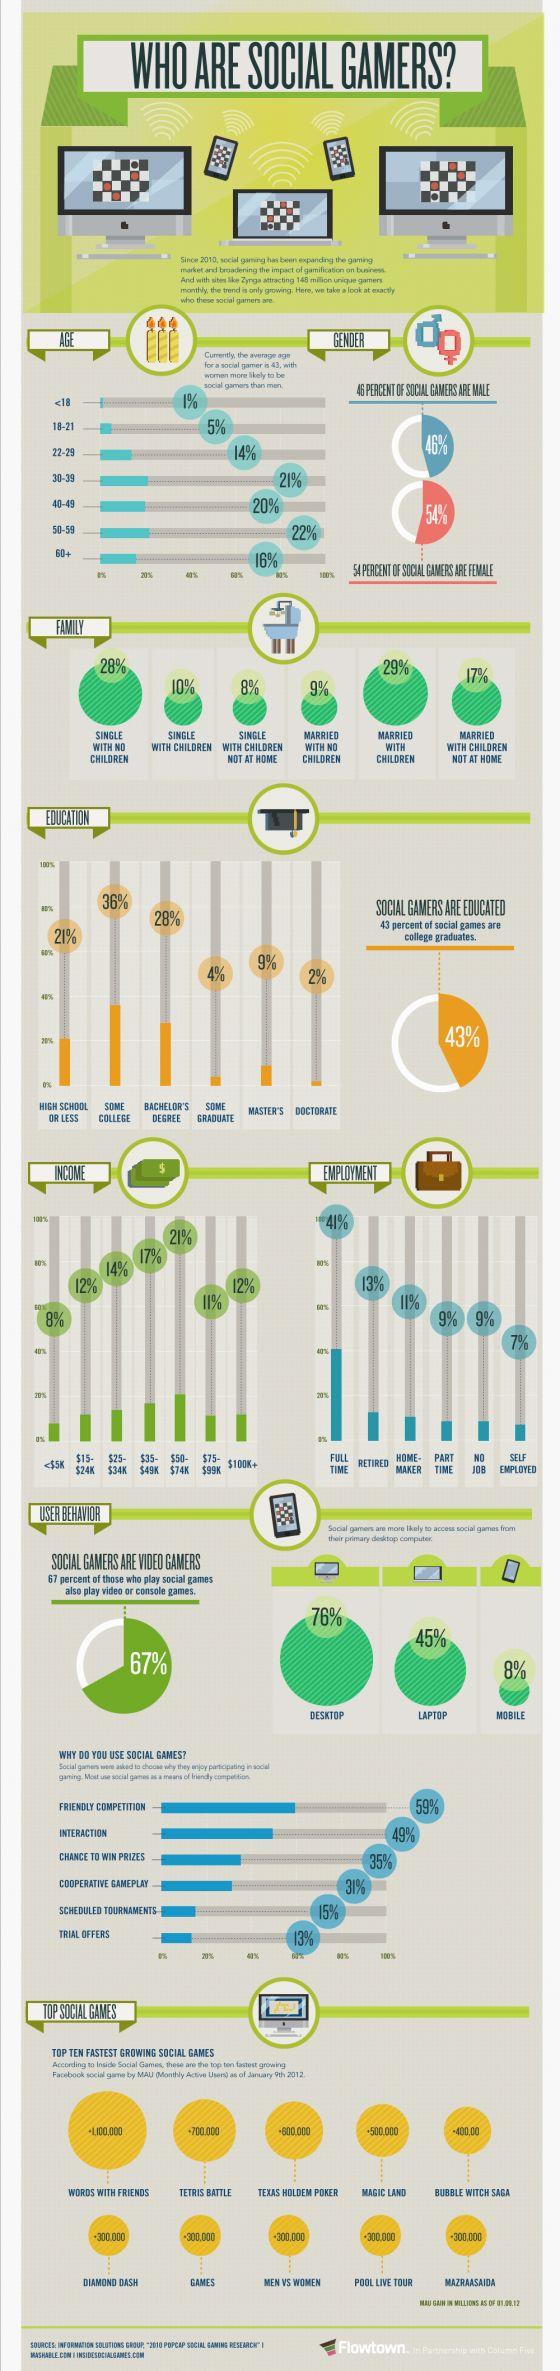 Infographic: Women play Social Games more than Men